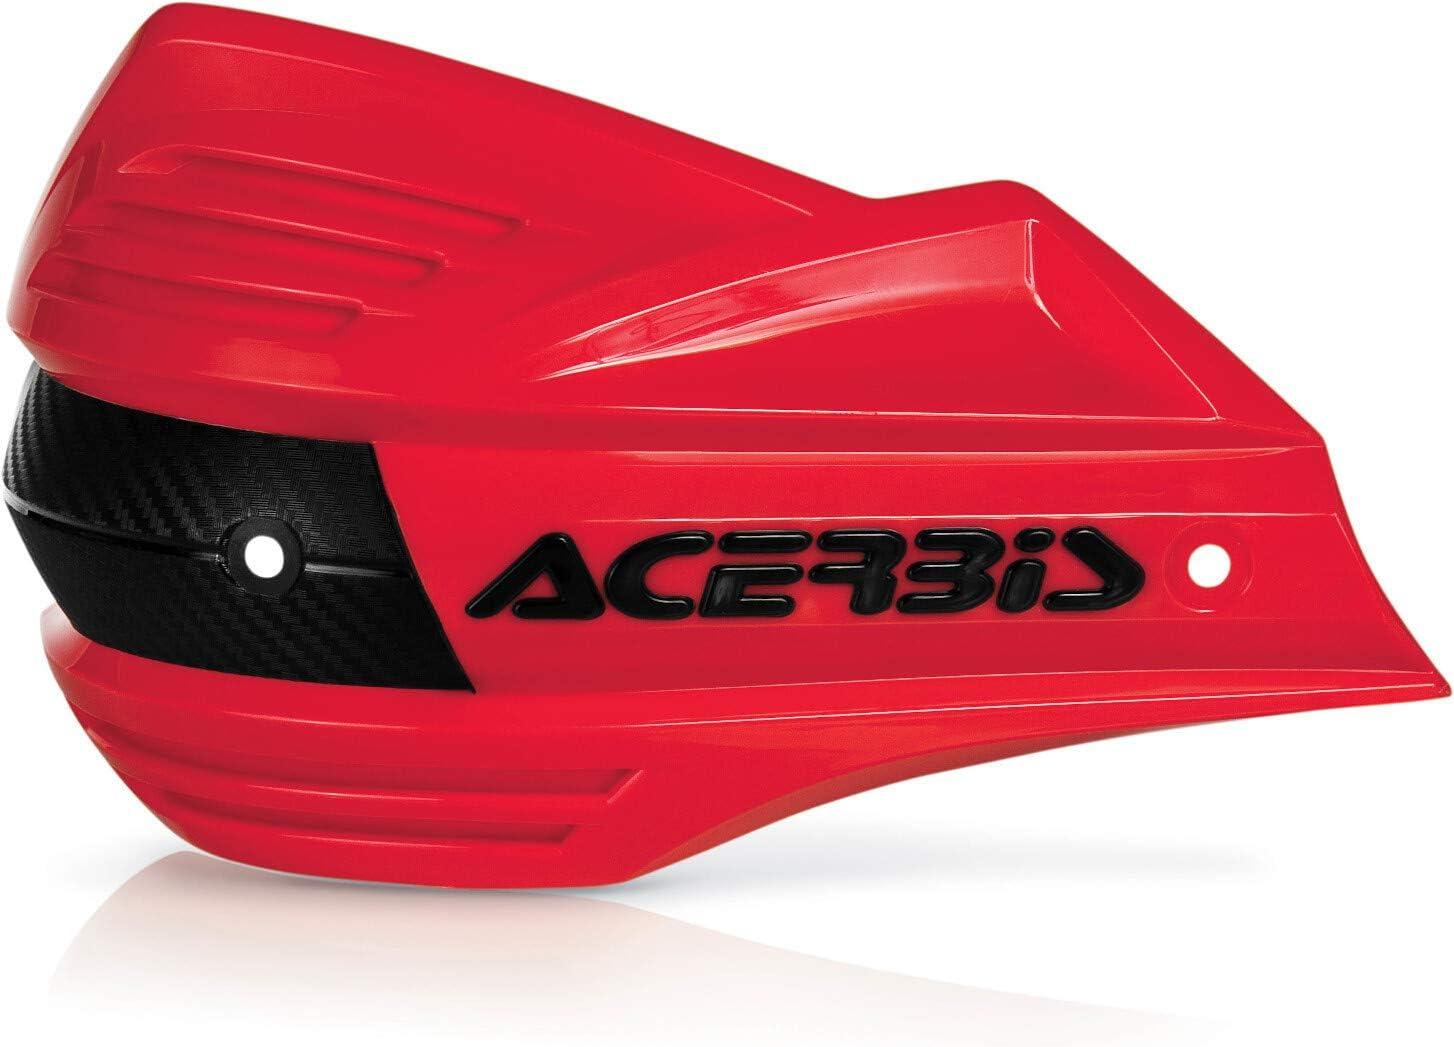 Acerbis Outlet sale feature Handshields X-Factor Red 2393480004 Under blast sales